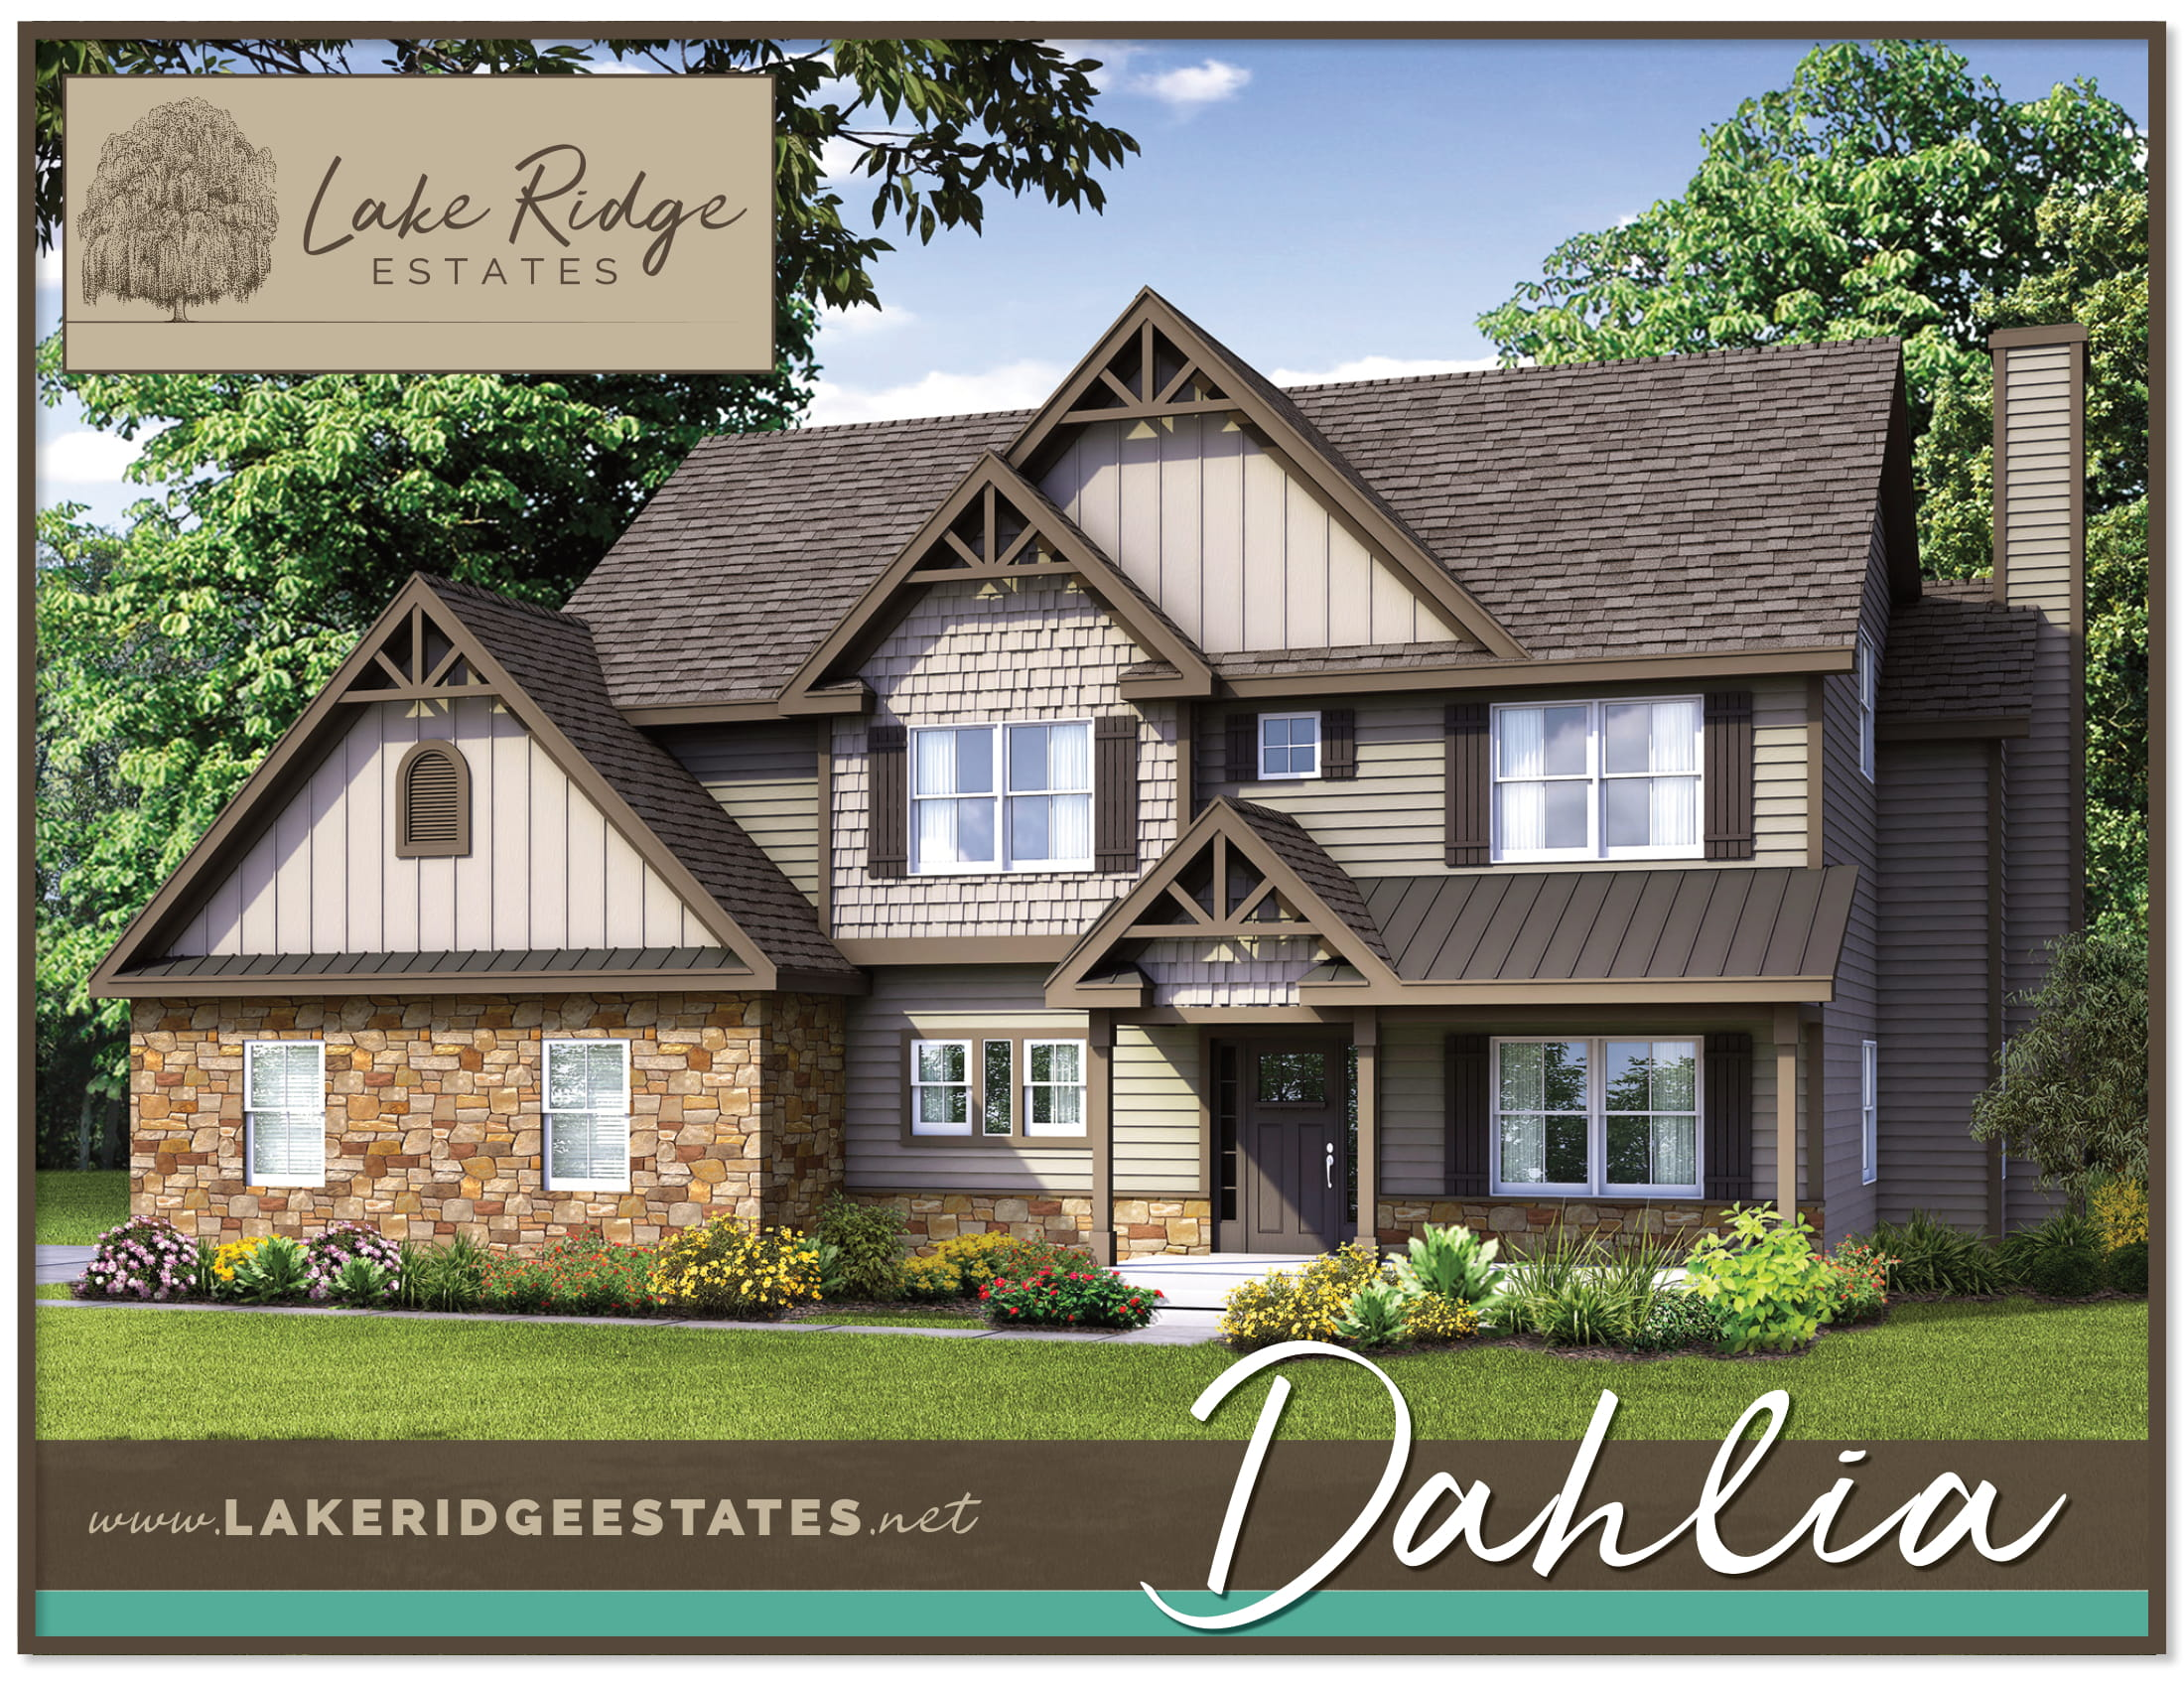 Christopher Ogden Middletown Ny Real Estate Thedahlia Lakeridge 1